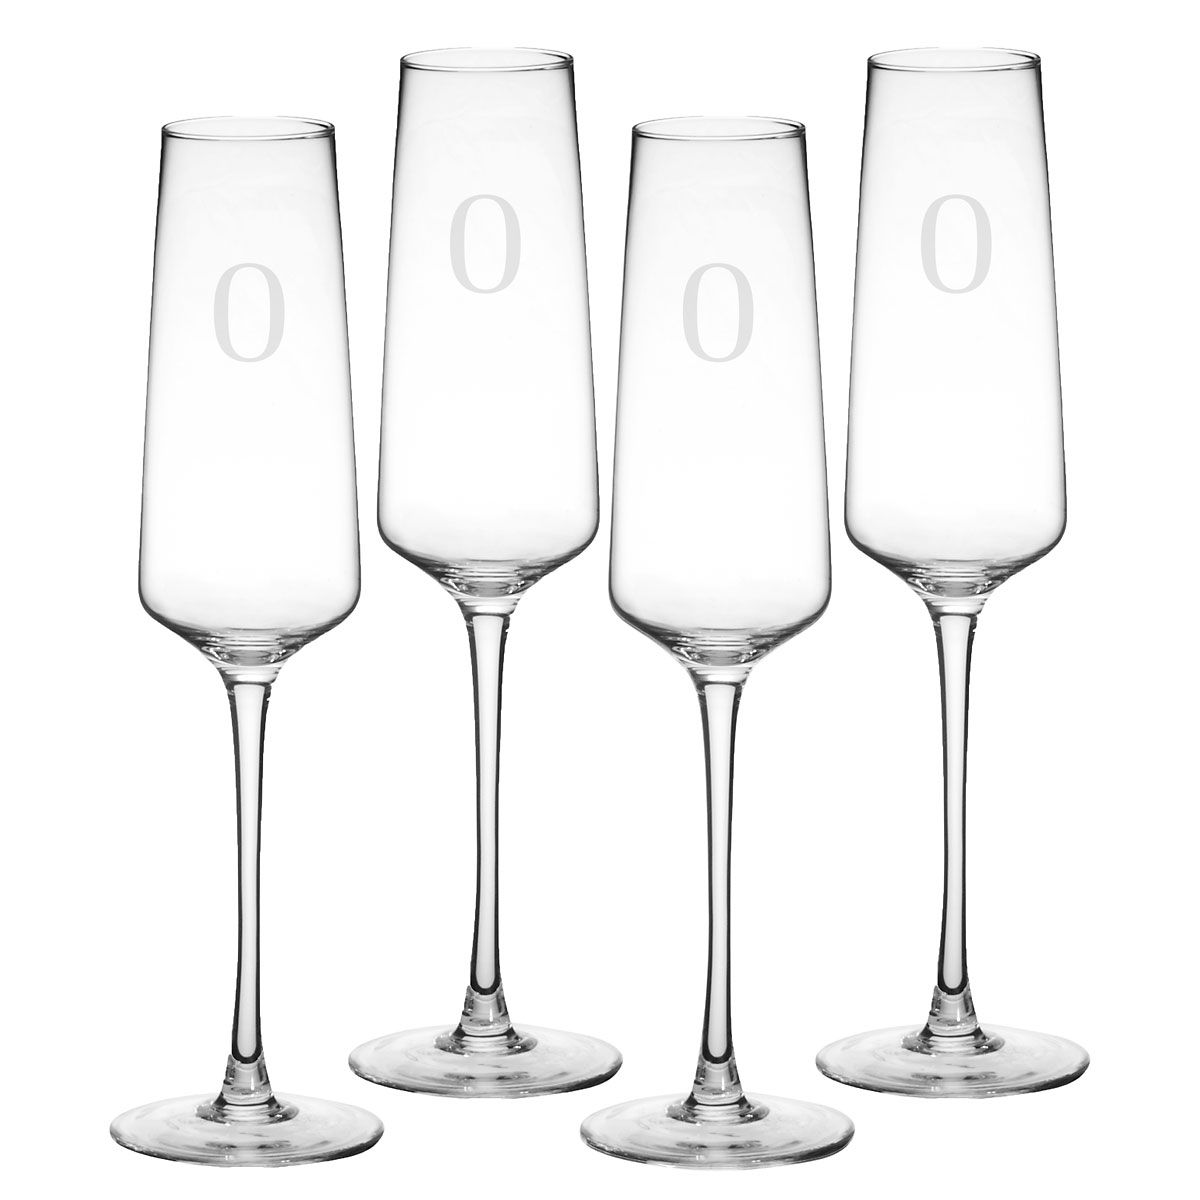 Personalized Estate Champagne Flutes